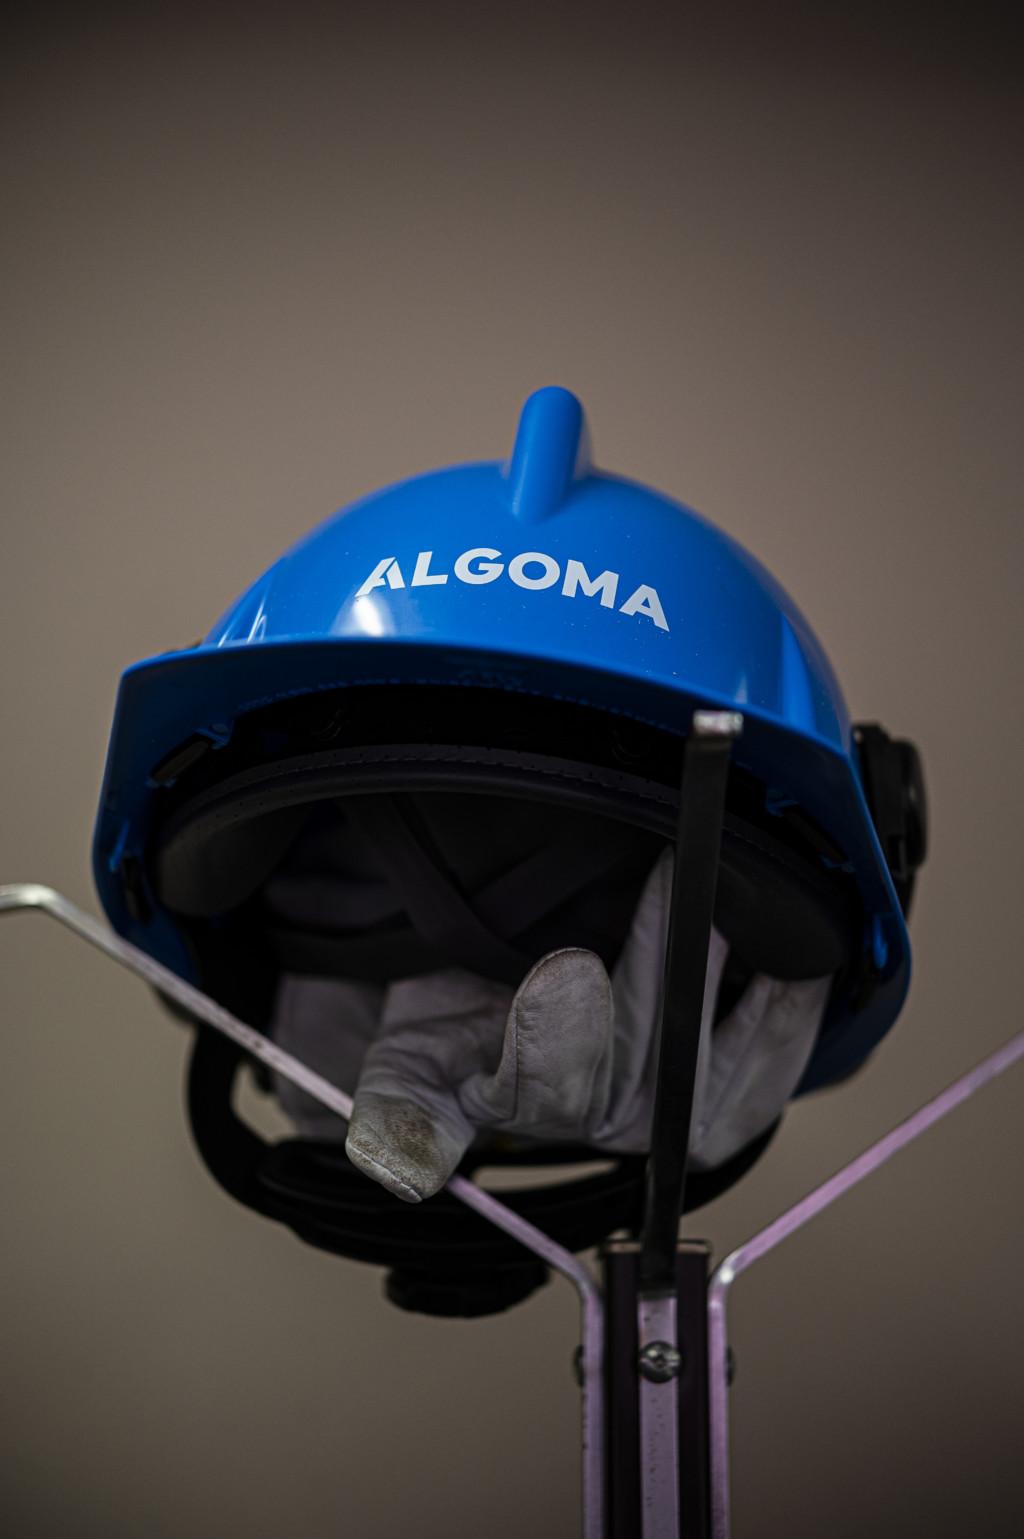 Algoma safety equipment